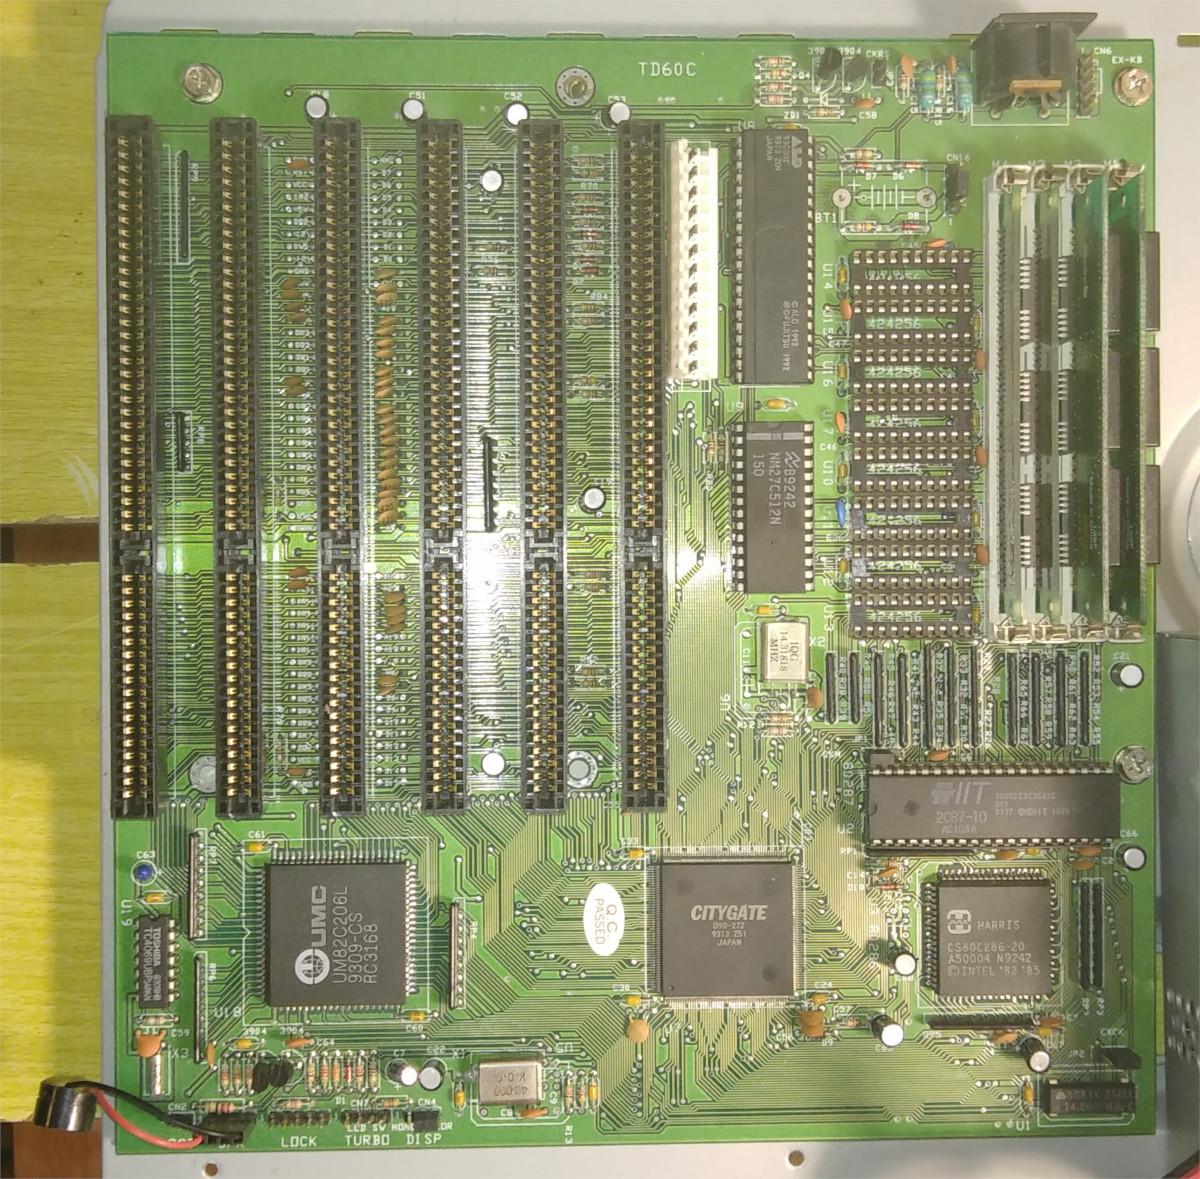 Материнская плата TD60C неизвестного производителя, 1992 г.